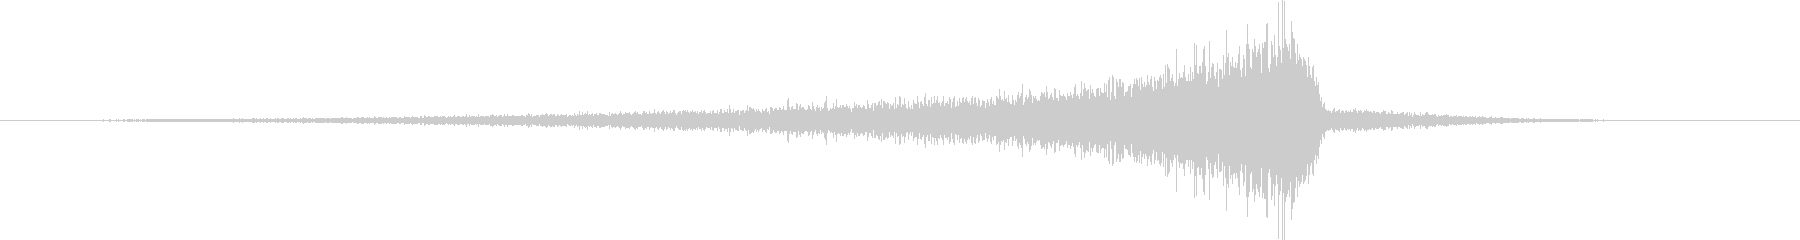 CINEMATIC REVERSE_02の未再生の波形